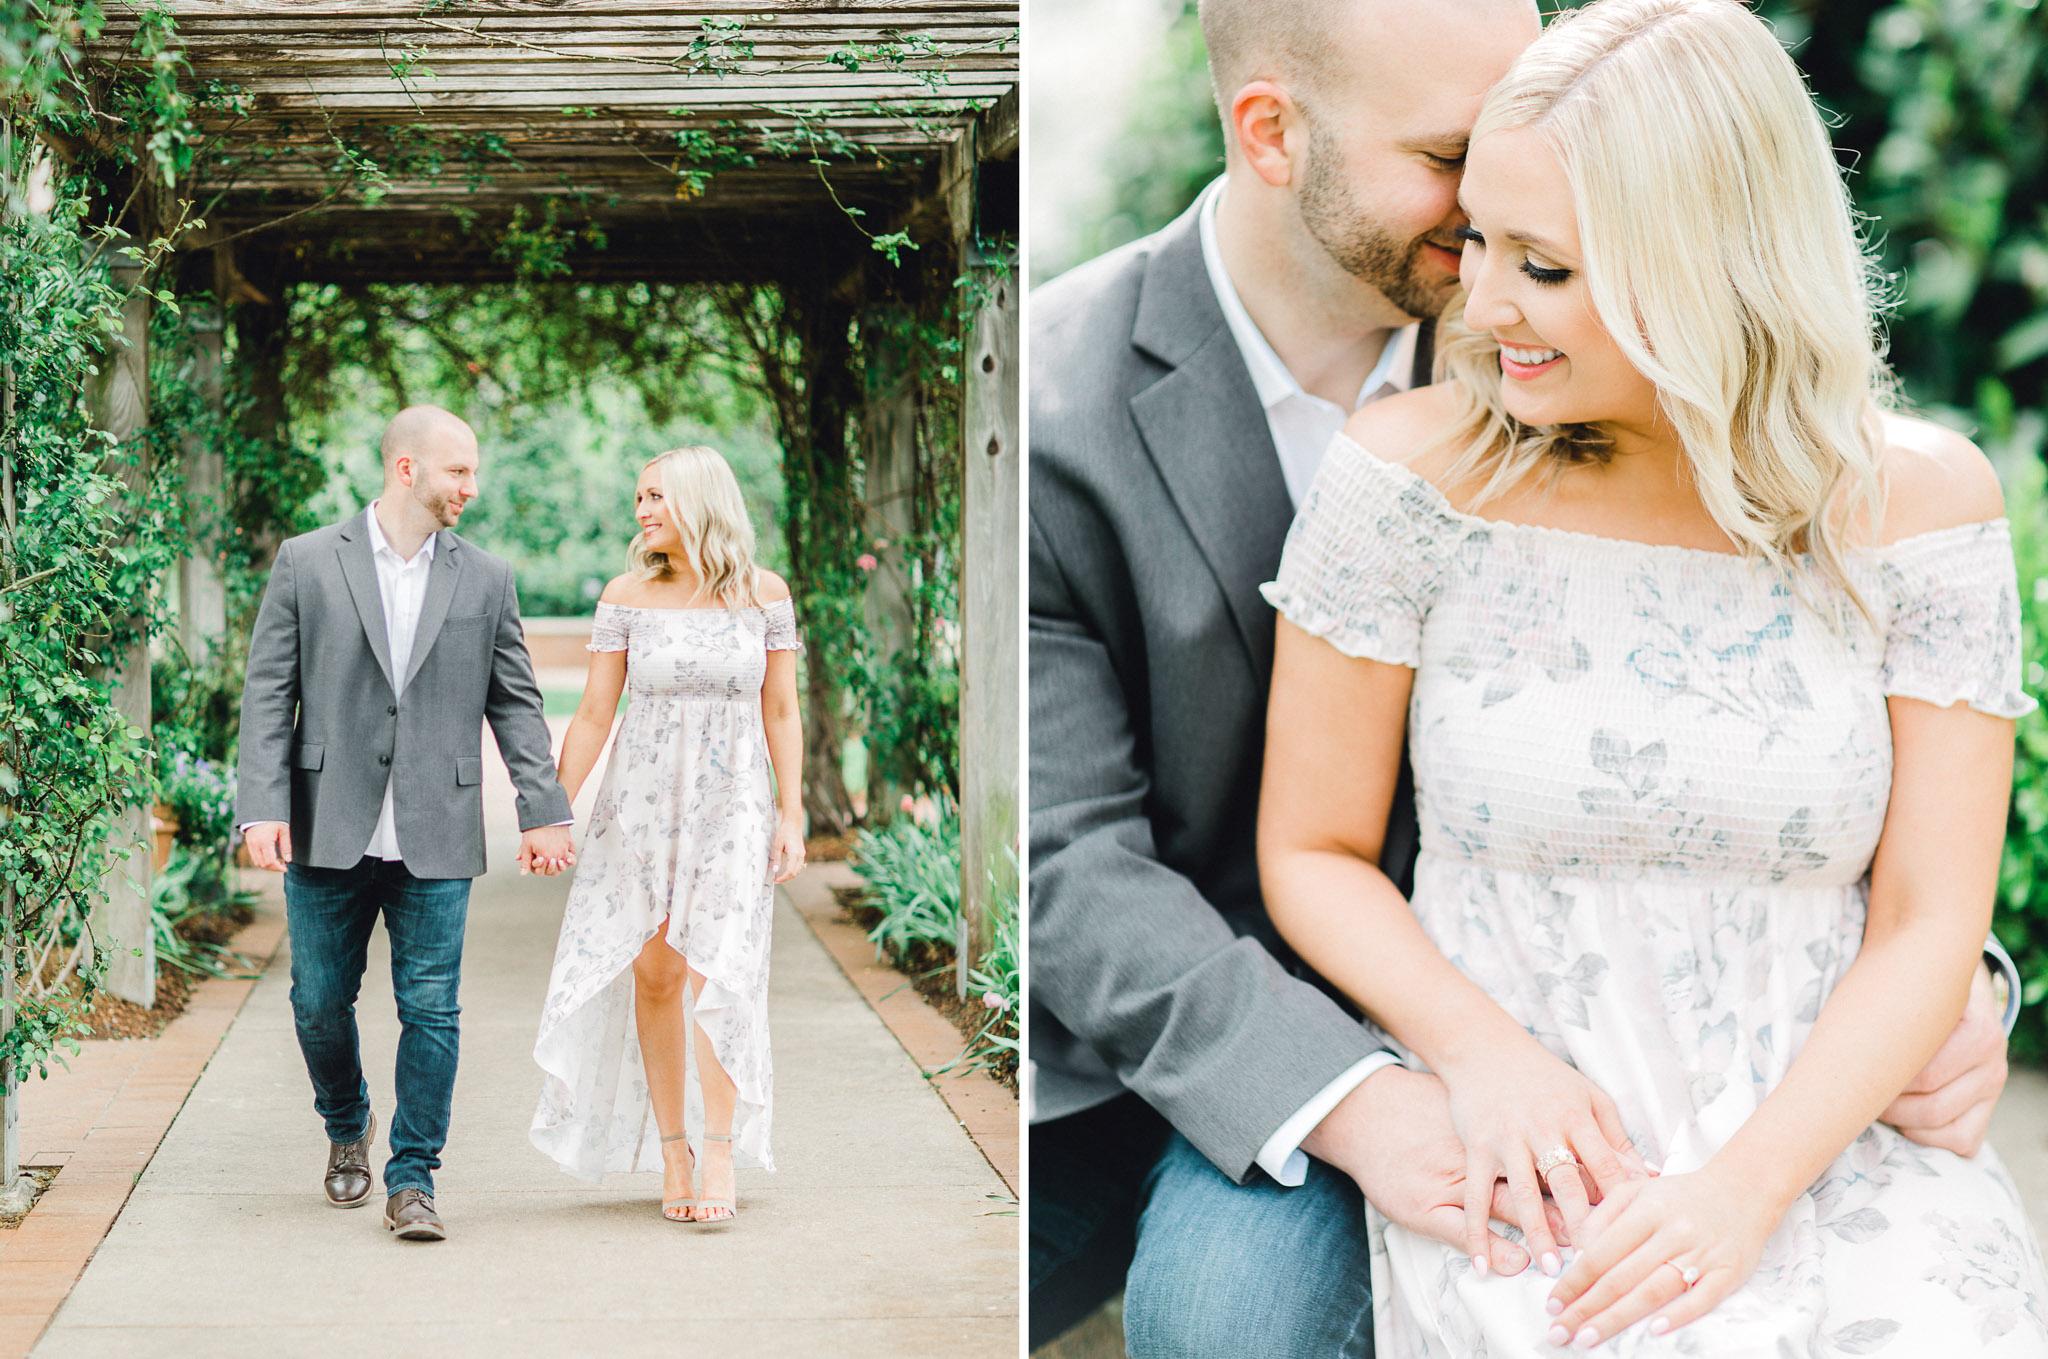 Wichita Falls Photographer - Wedding Photography